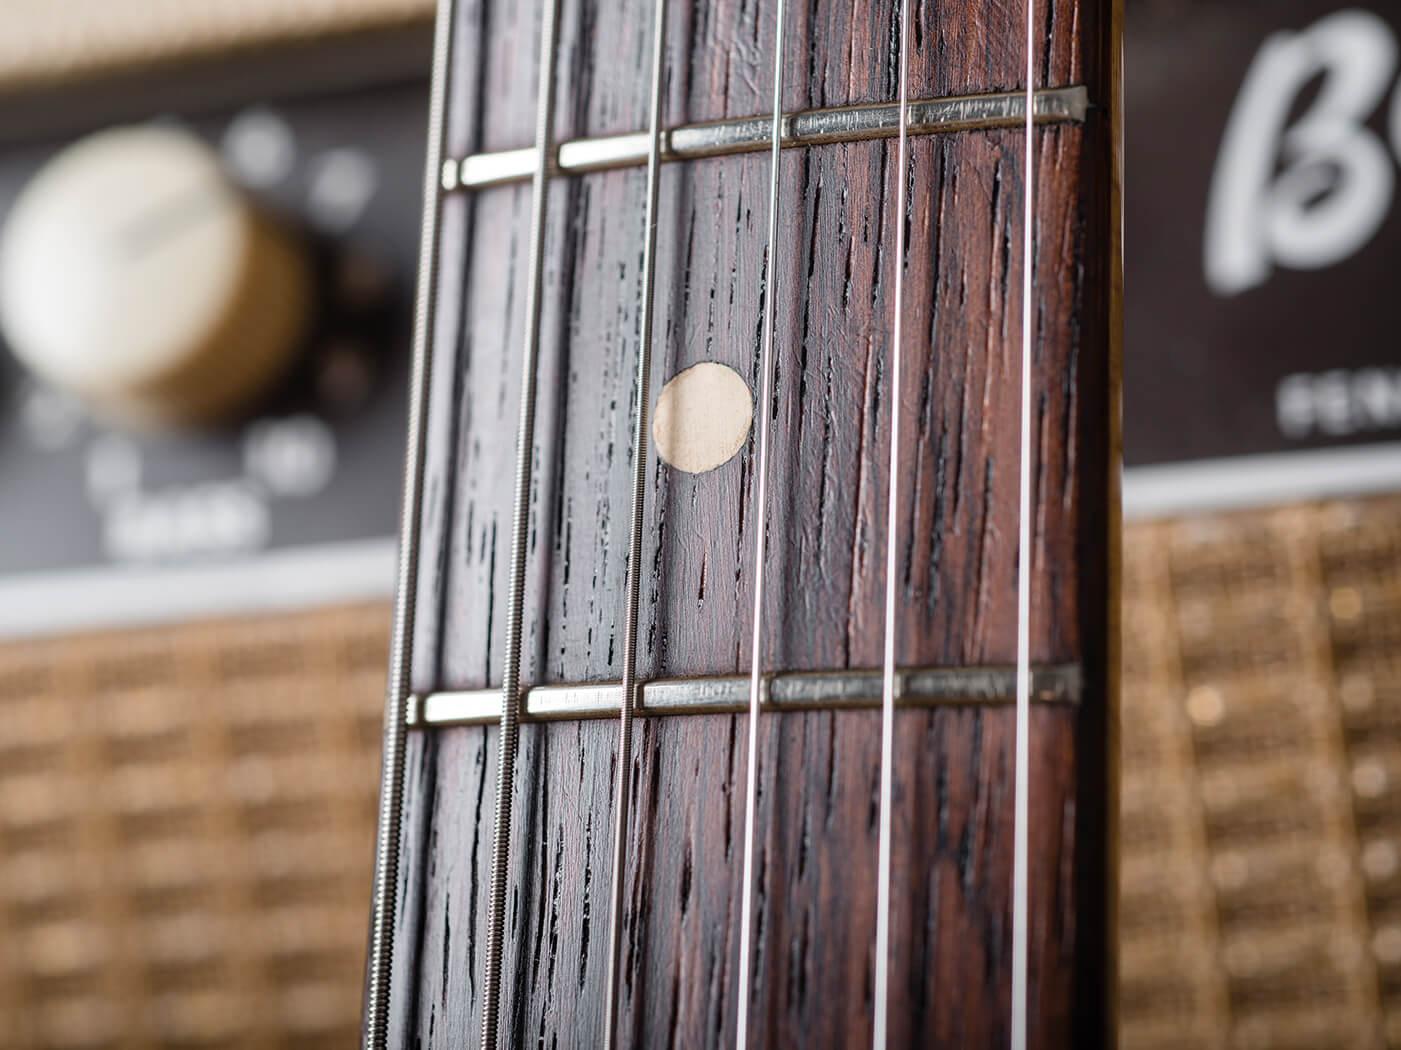 Fender Pre-CBS Surf Green Strat fingerboard close up